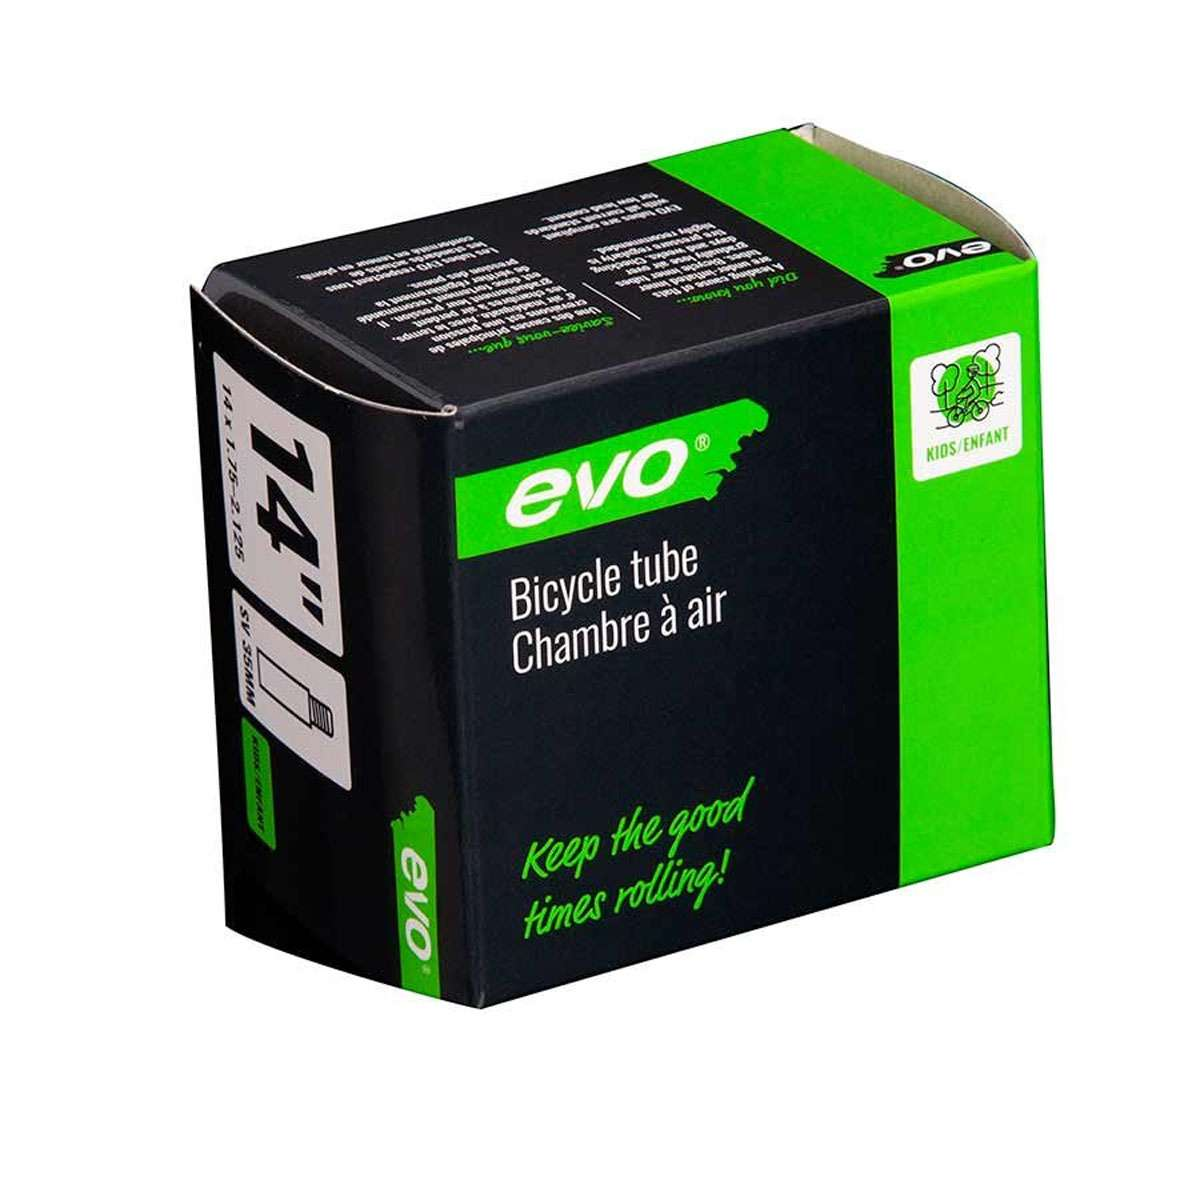 Evo Bicycle Tube - Schrader, 35mm, 14', 1.75-2.125 - 14EV.020176-03